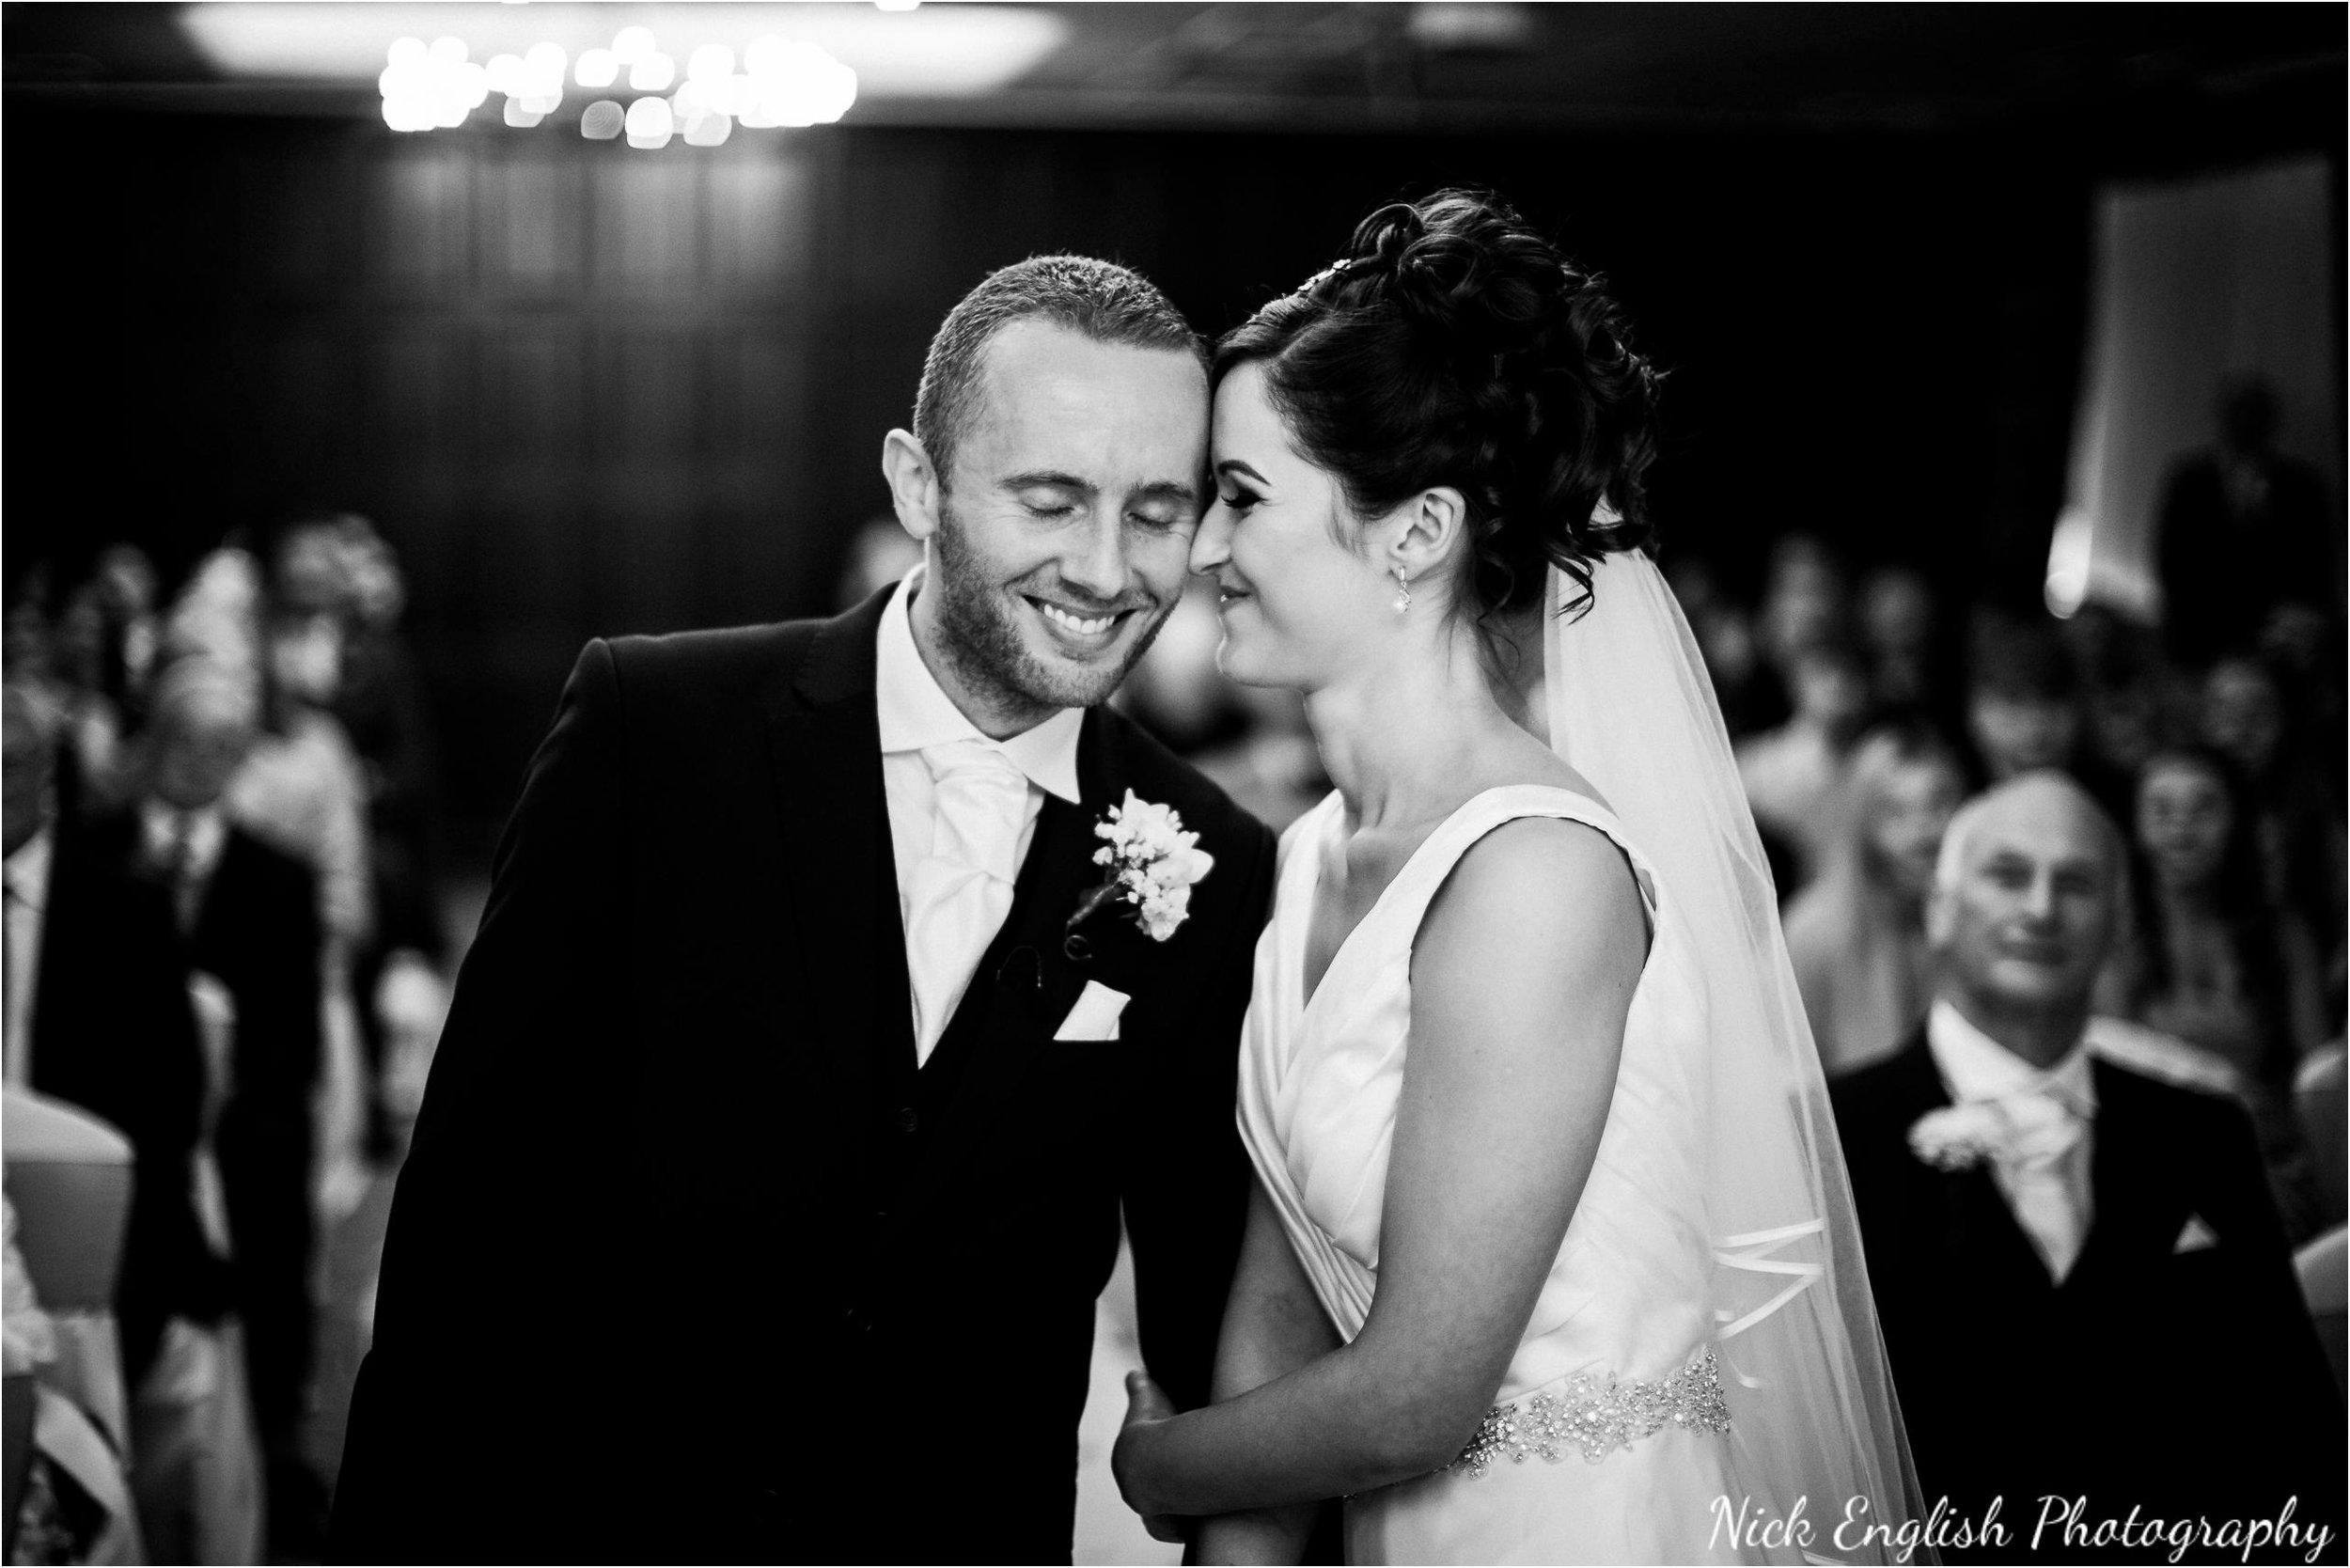 Emily David Wedding Photographs at Barton Grange Preston by Nick English Photography 79jpg.jpeg